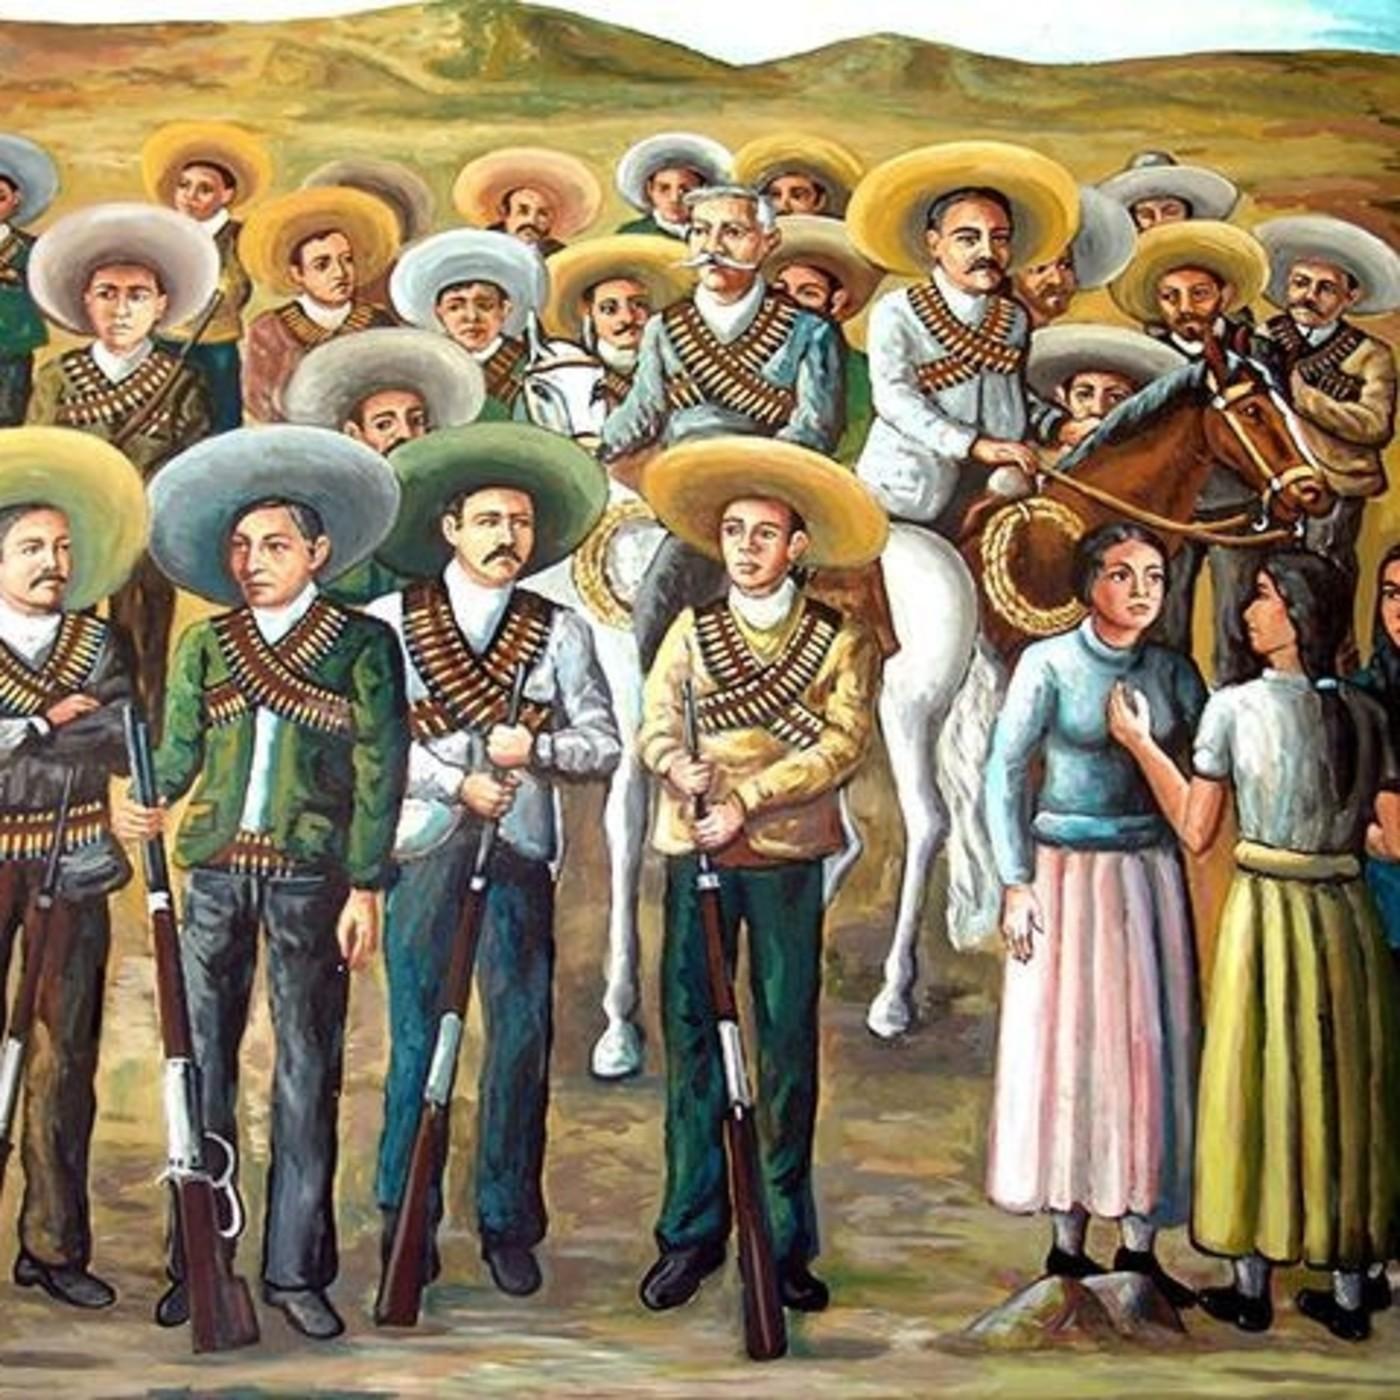 Fotos de la revolucion mexicana de 1910 99